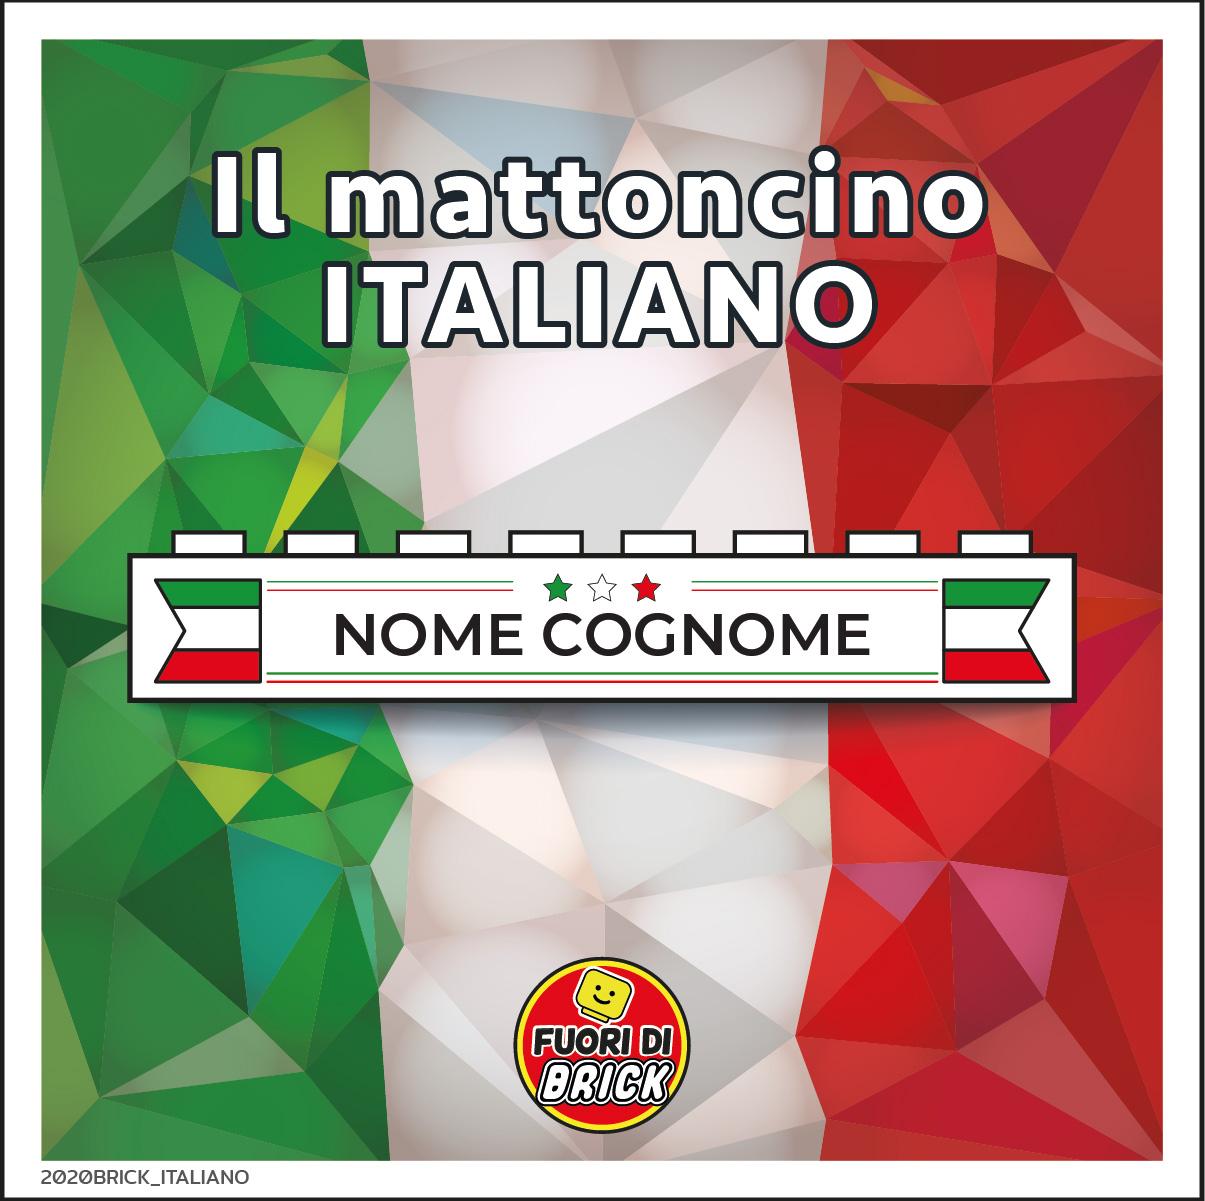 2020_brick__2020BRICK_ITALIANO